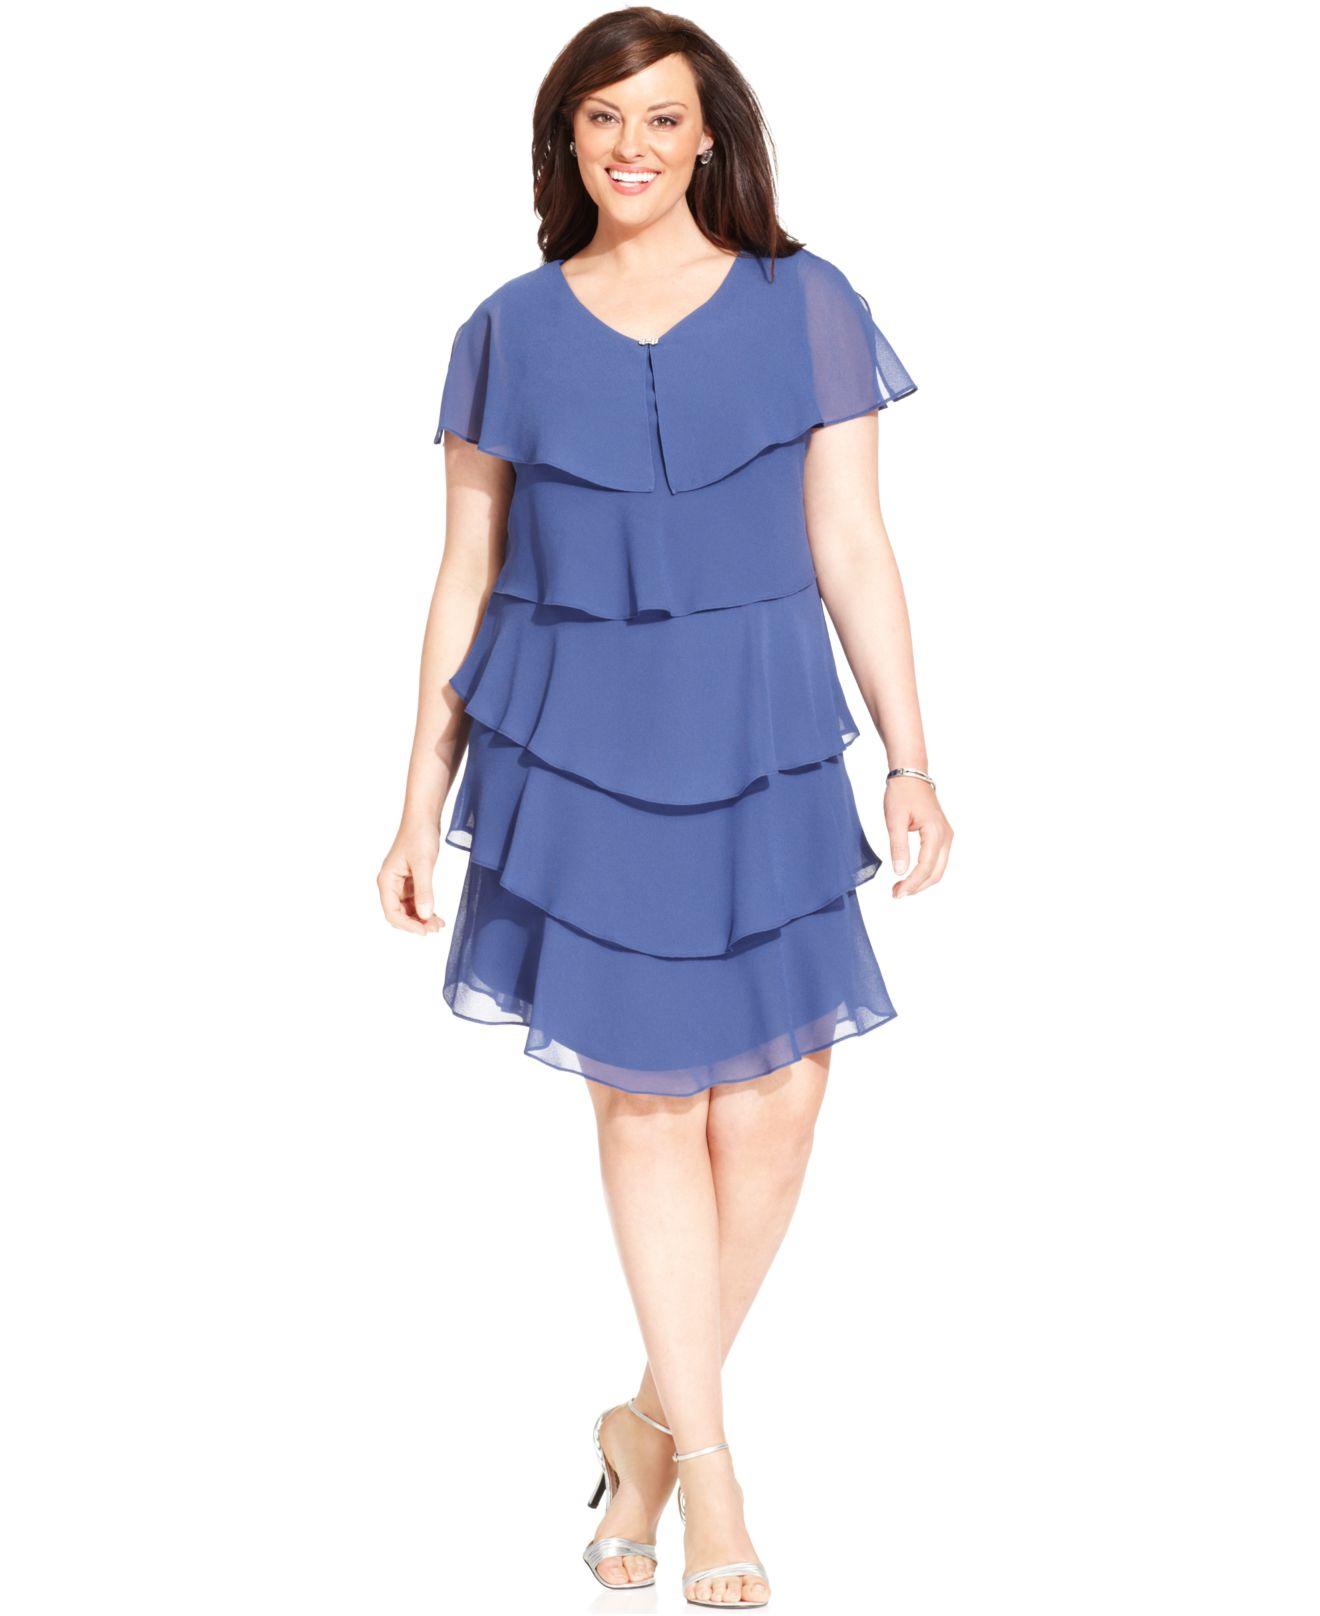 Plus Size Shortsleeve Tiered Dress